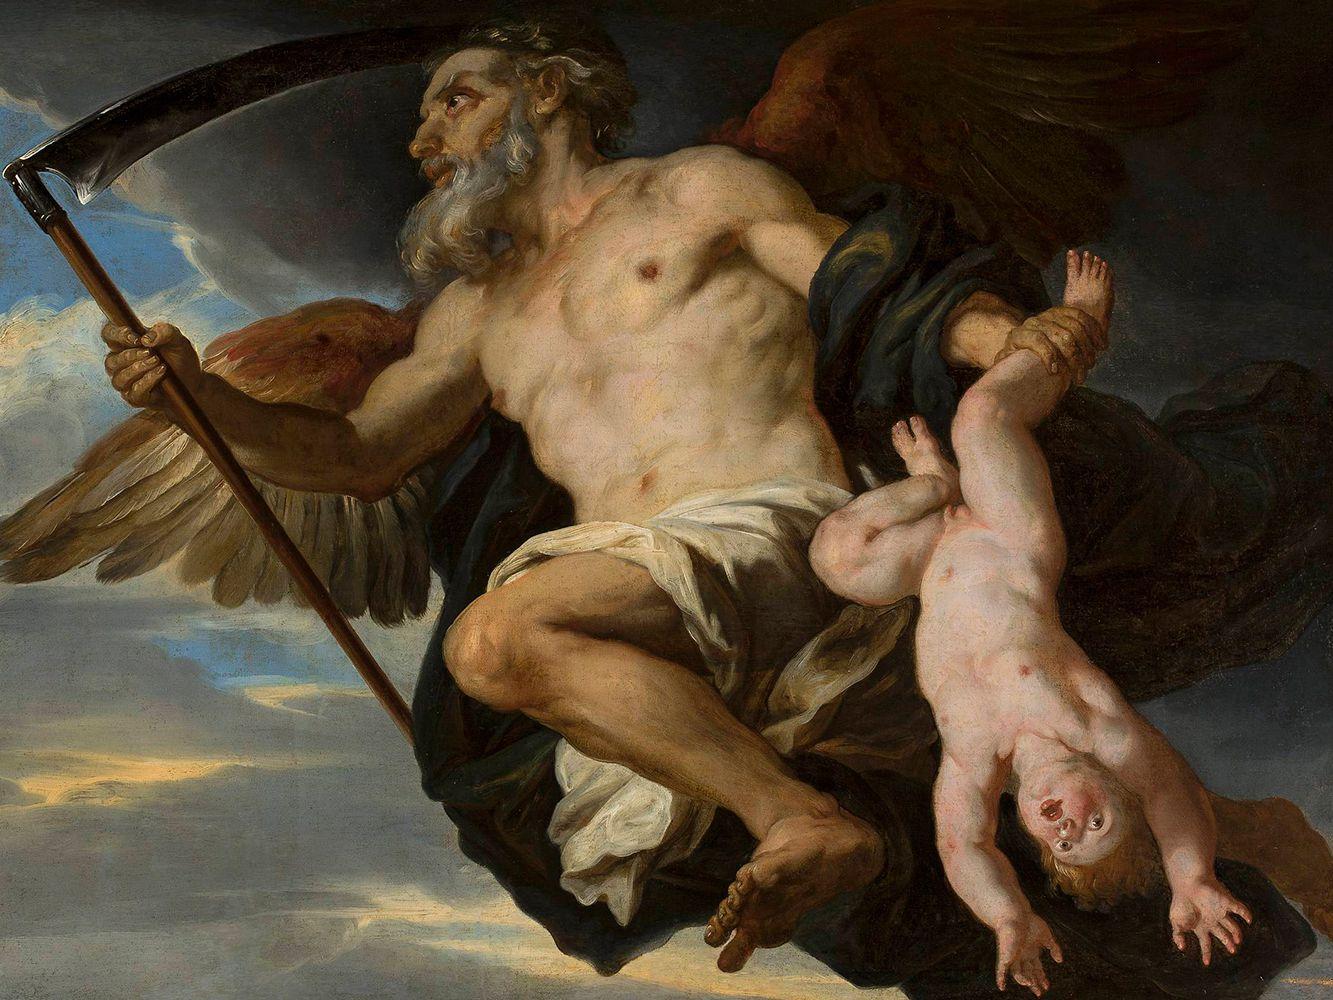 Kronos Mythology: Learn More About the Greek God